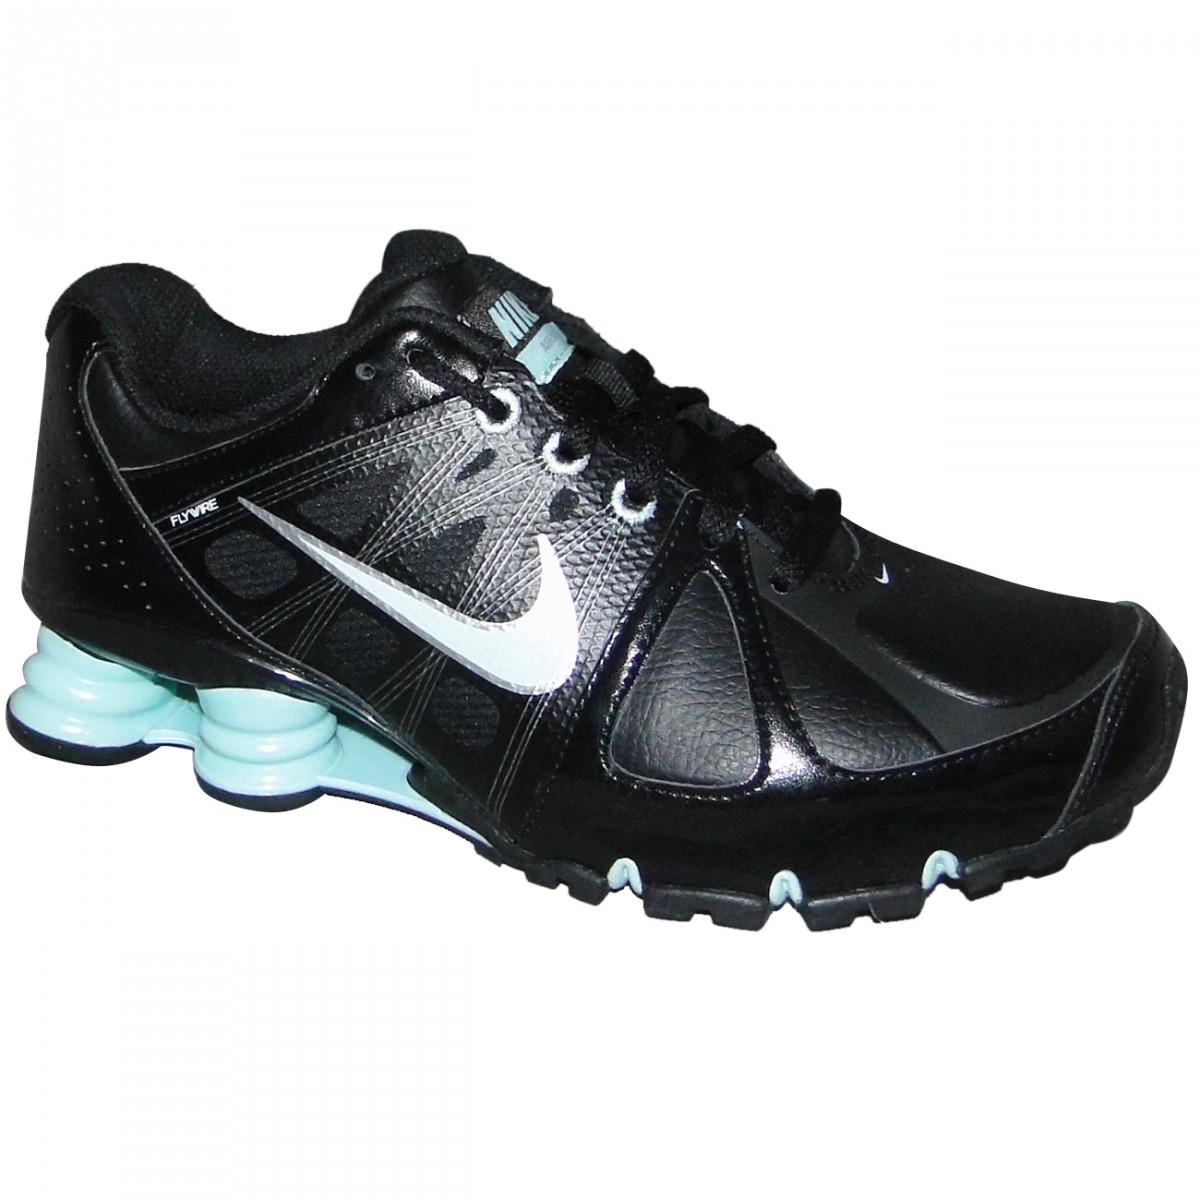 Tênis Nike Shox Agent Sl 510960002 - Preto Verde - Chuteira Nike ... 4e6cbf92564